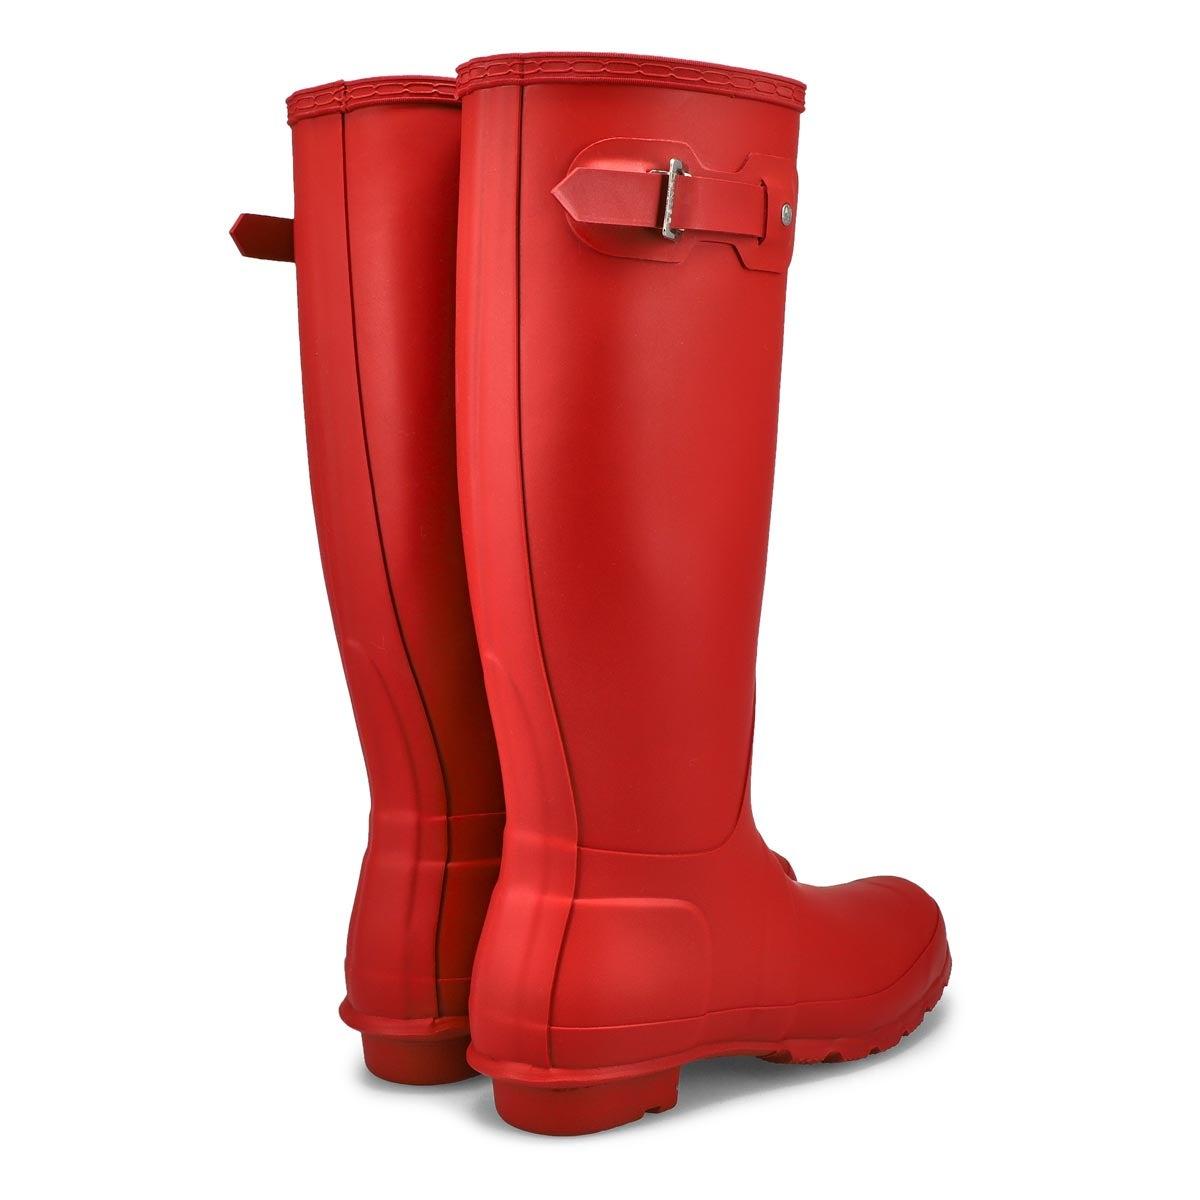 Lds Original Tall Classic red rain boot